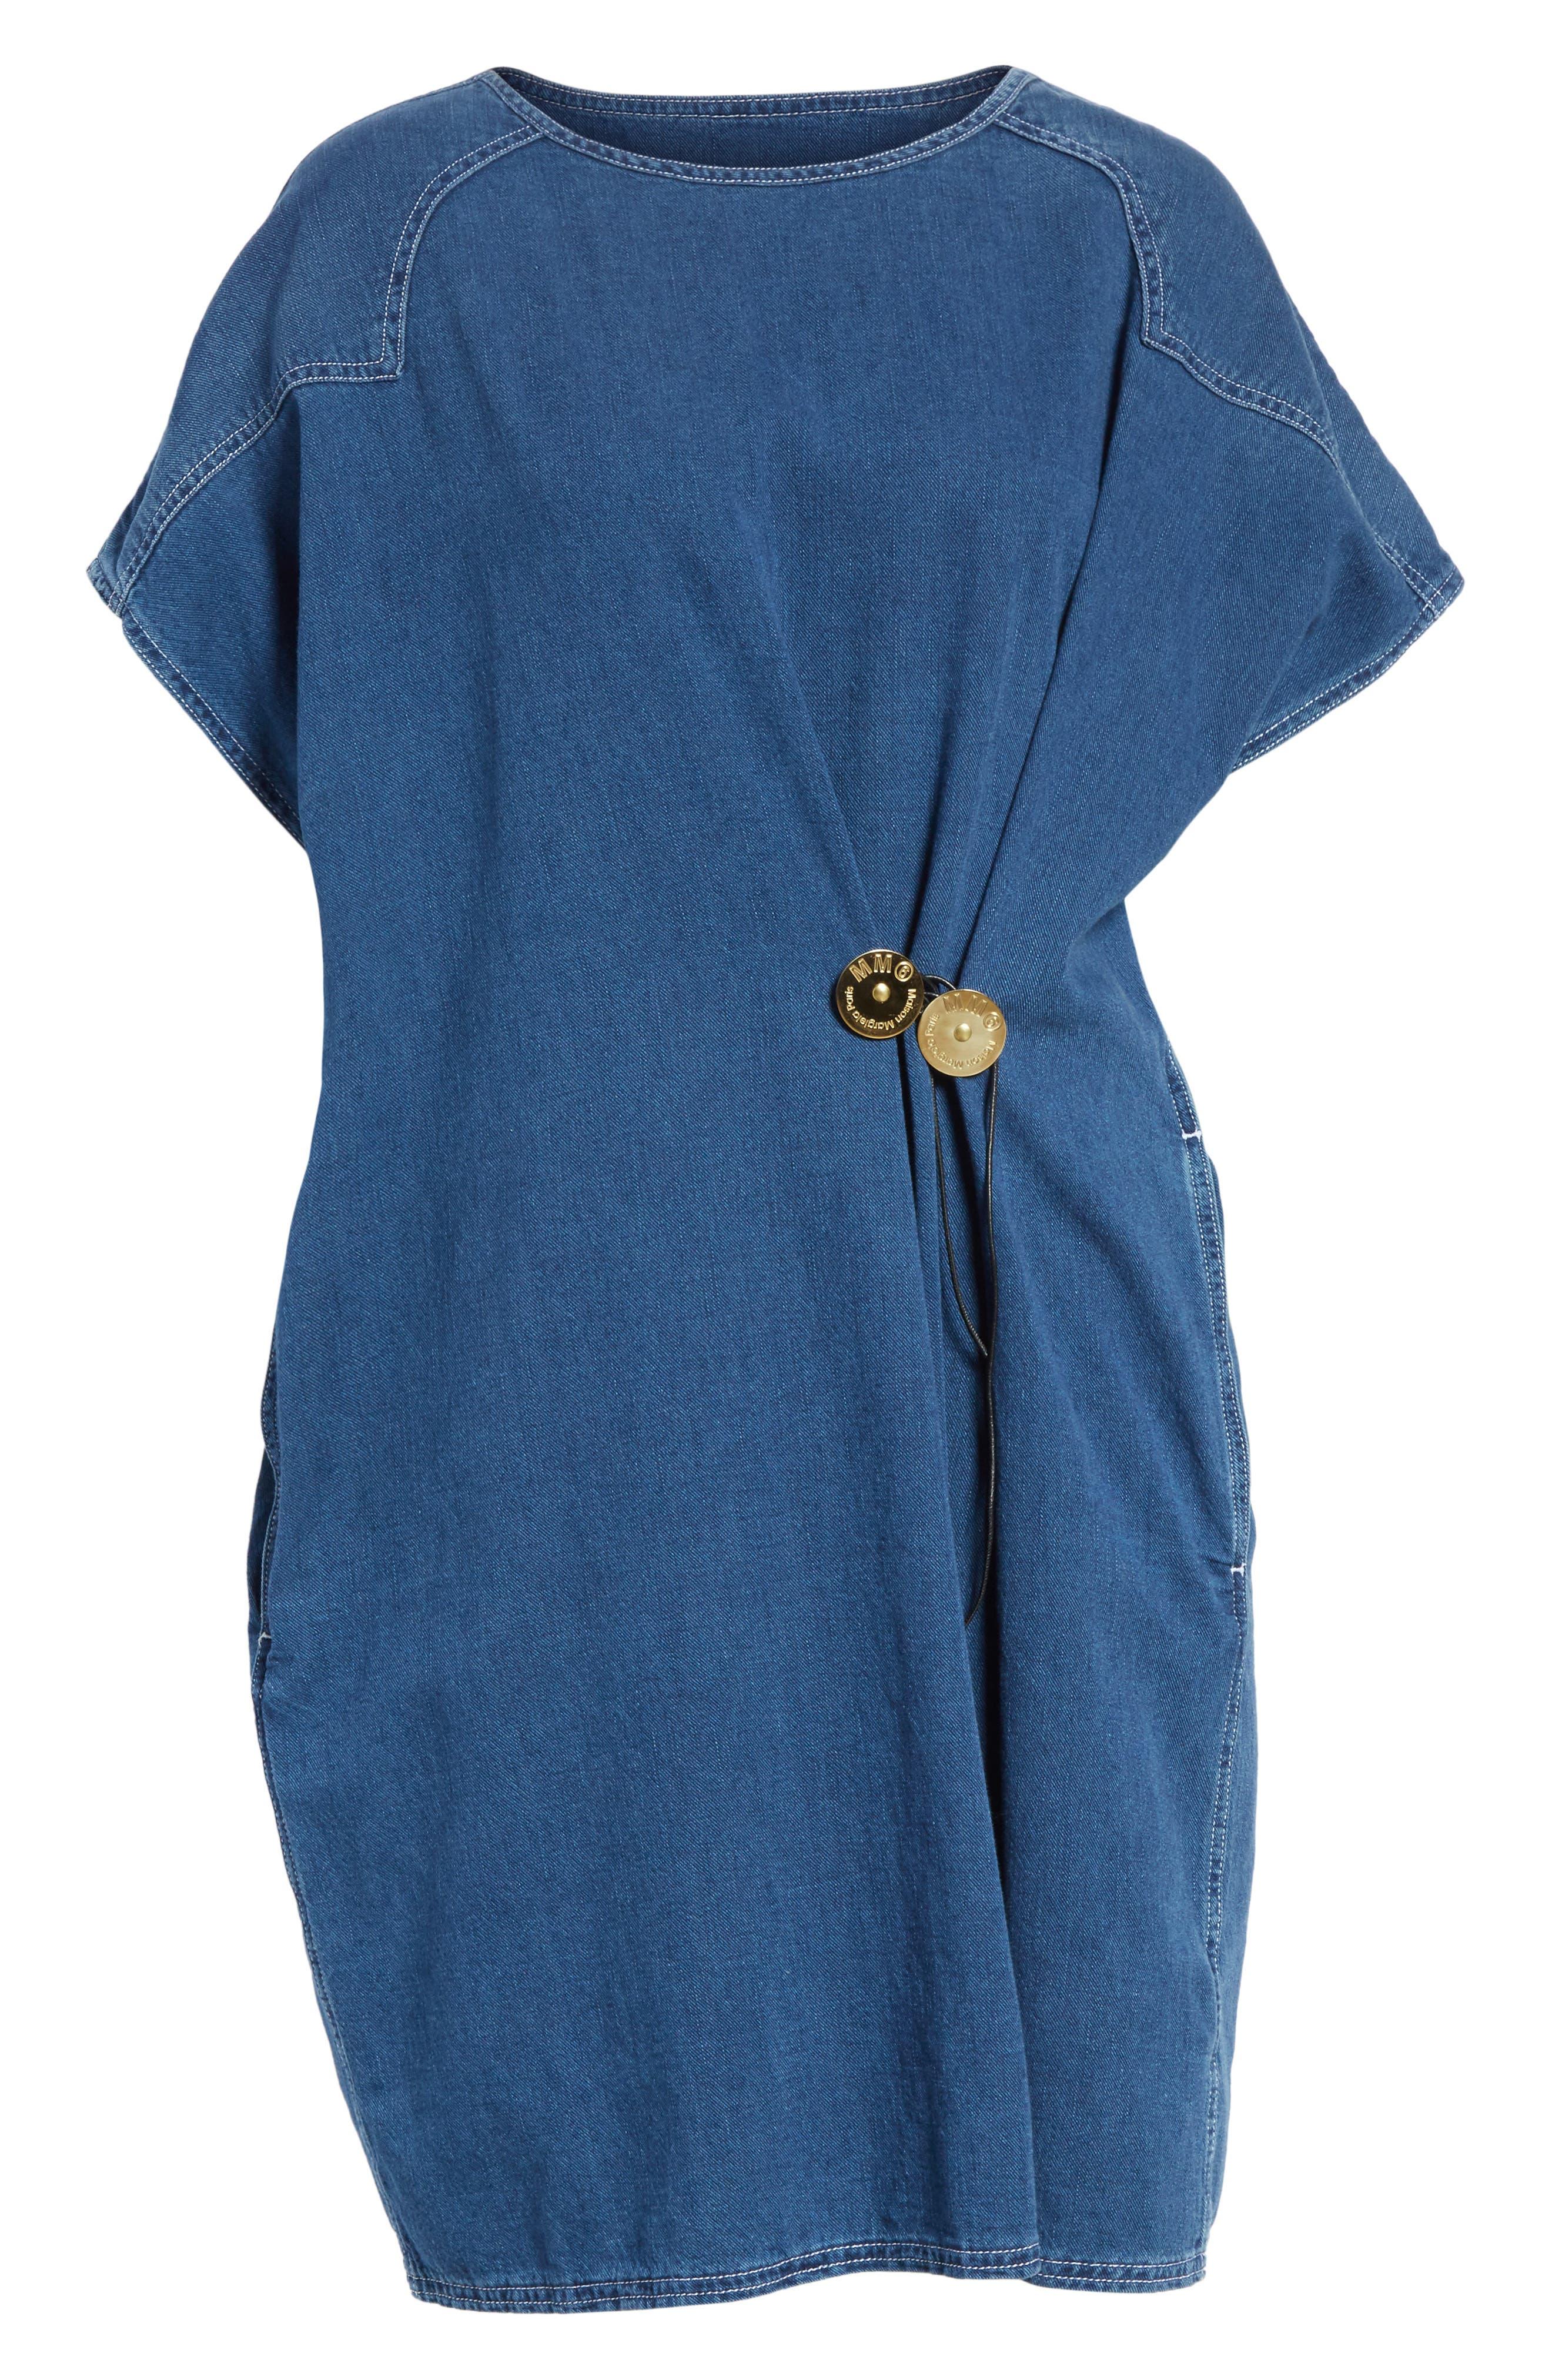 '80s Wash Denim Dress,                             Alternate thumbnail 6, color,                             Medium Blue